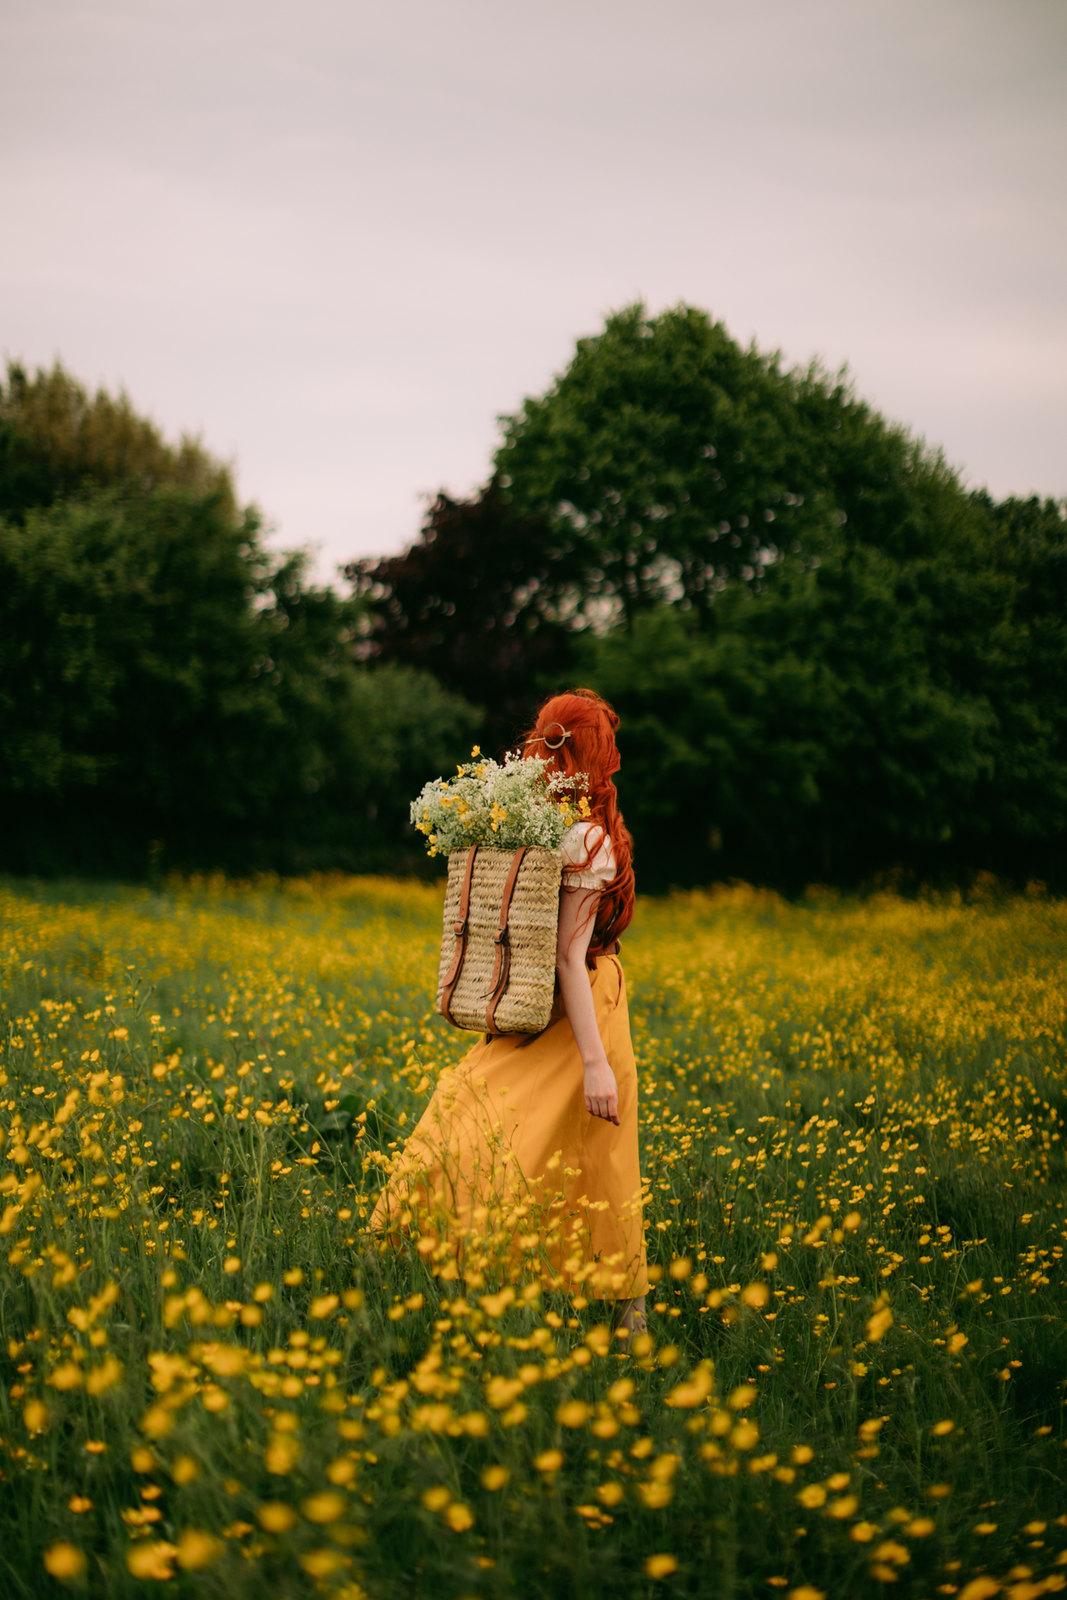 emmy design sweden, cottagecore dress, cottagecore aesthetic, hobbit fashion, hobbitcore, fairycore, buttercup field, summer fashion, folk fashion, cottagecore, cottagefairy